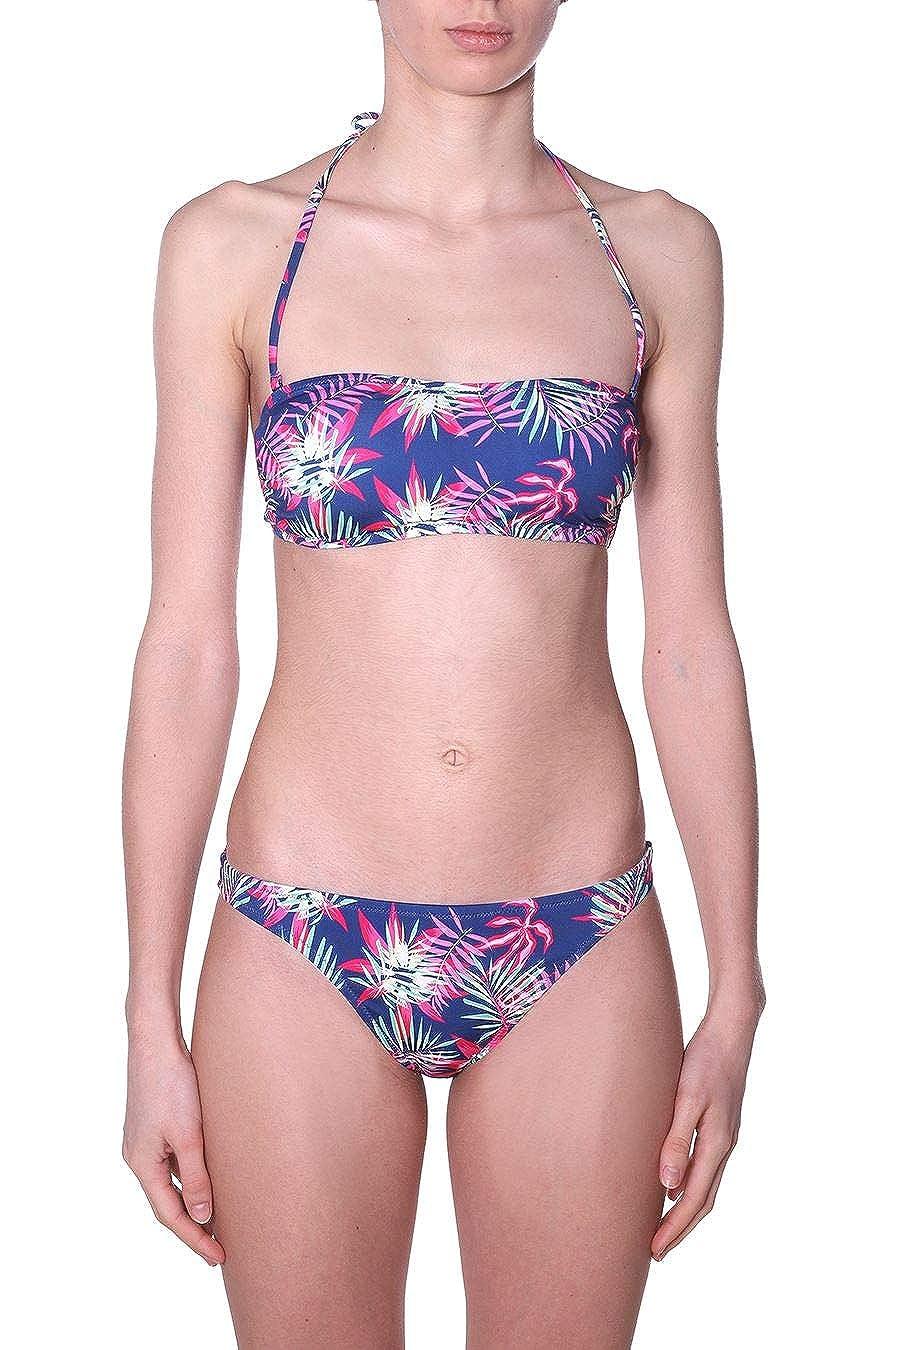 007 Navy  SUNDEK Marica W168KNL36PG PESD Bikini pour Femme